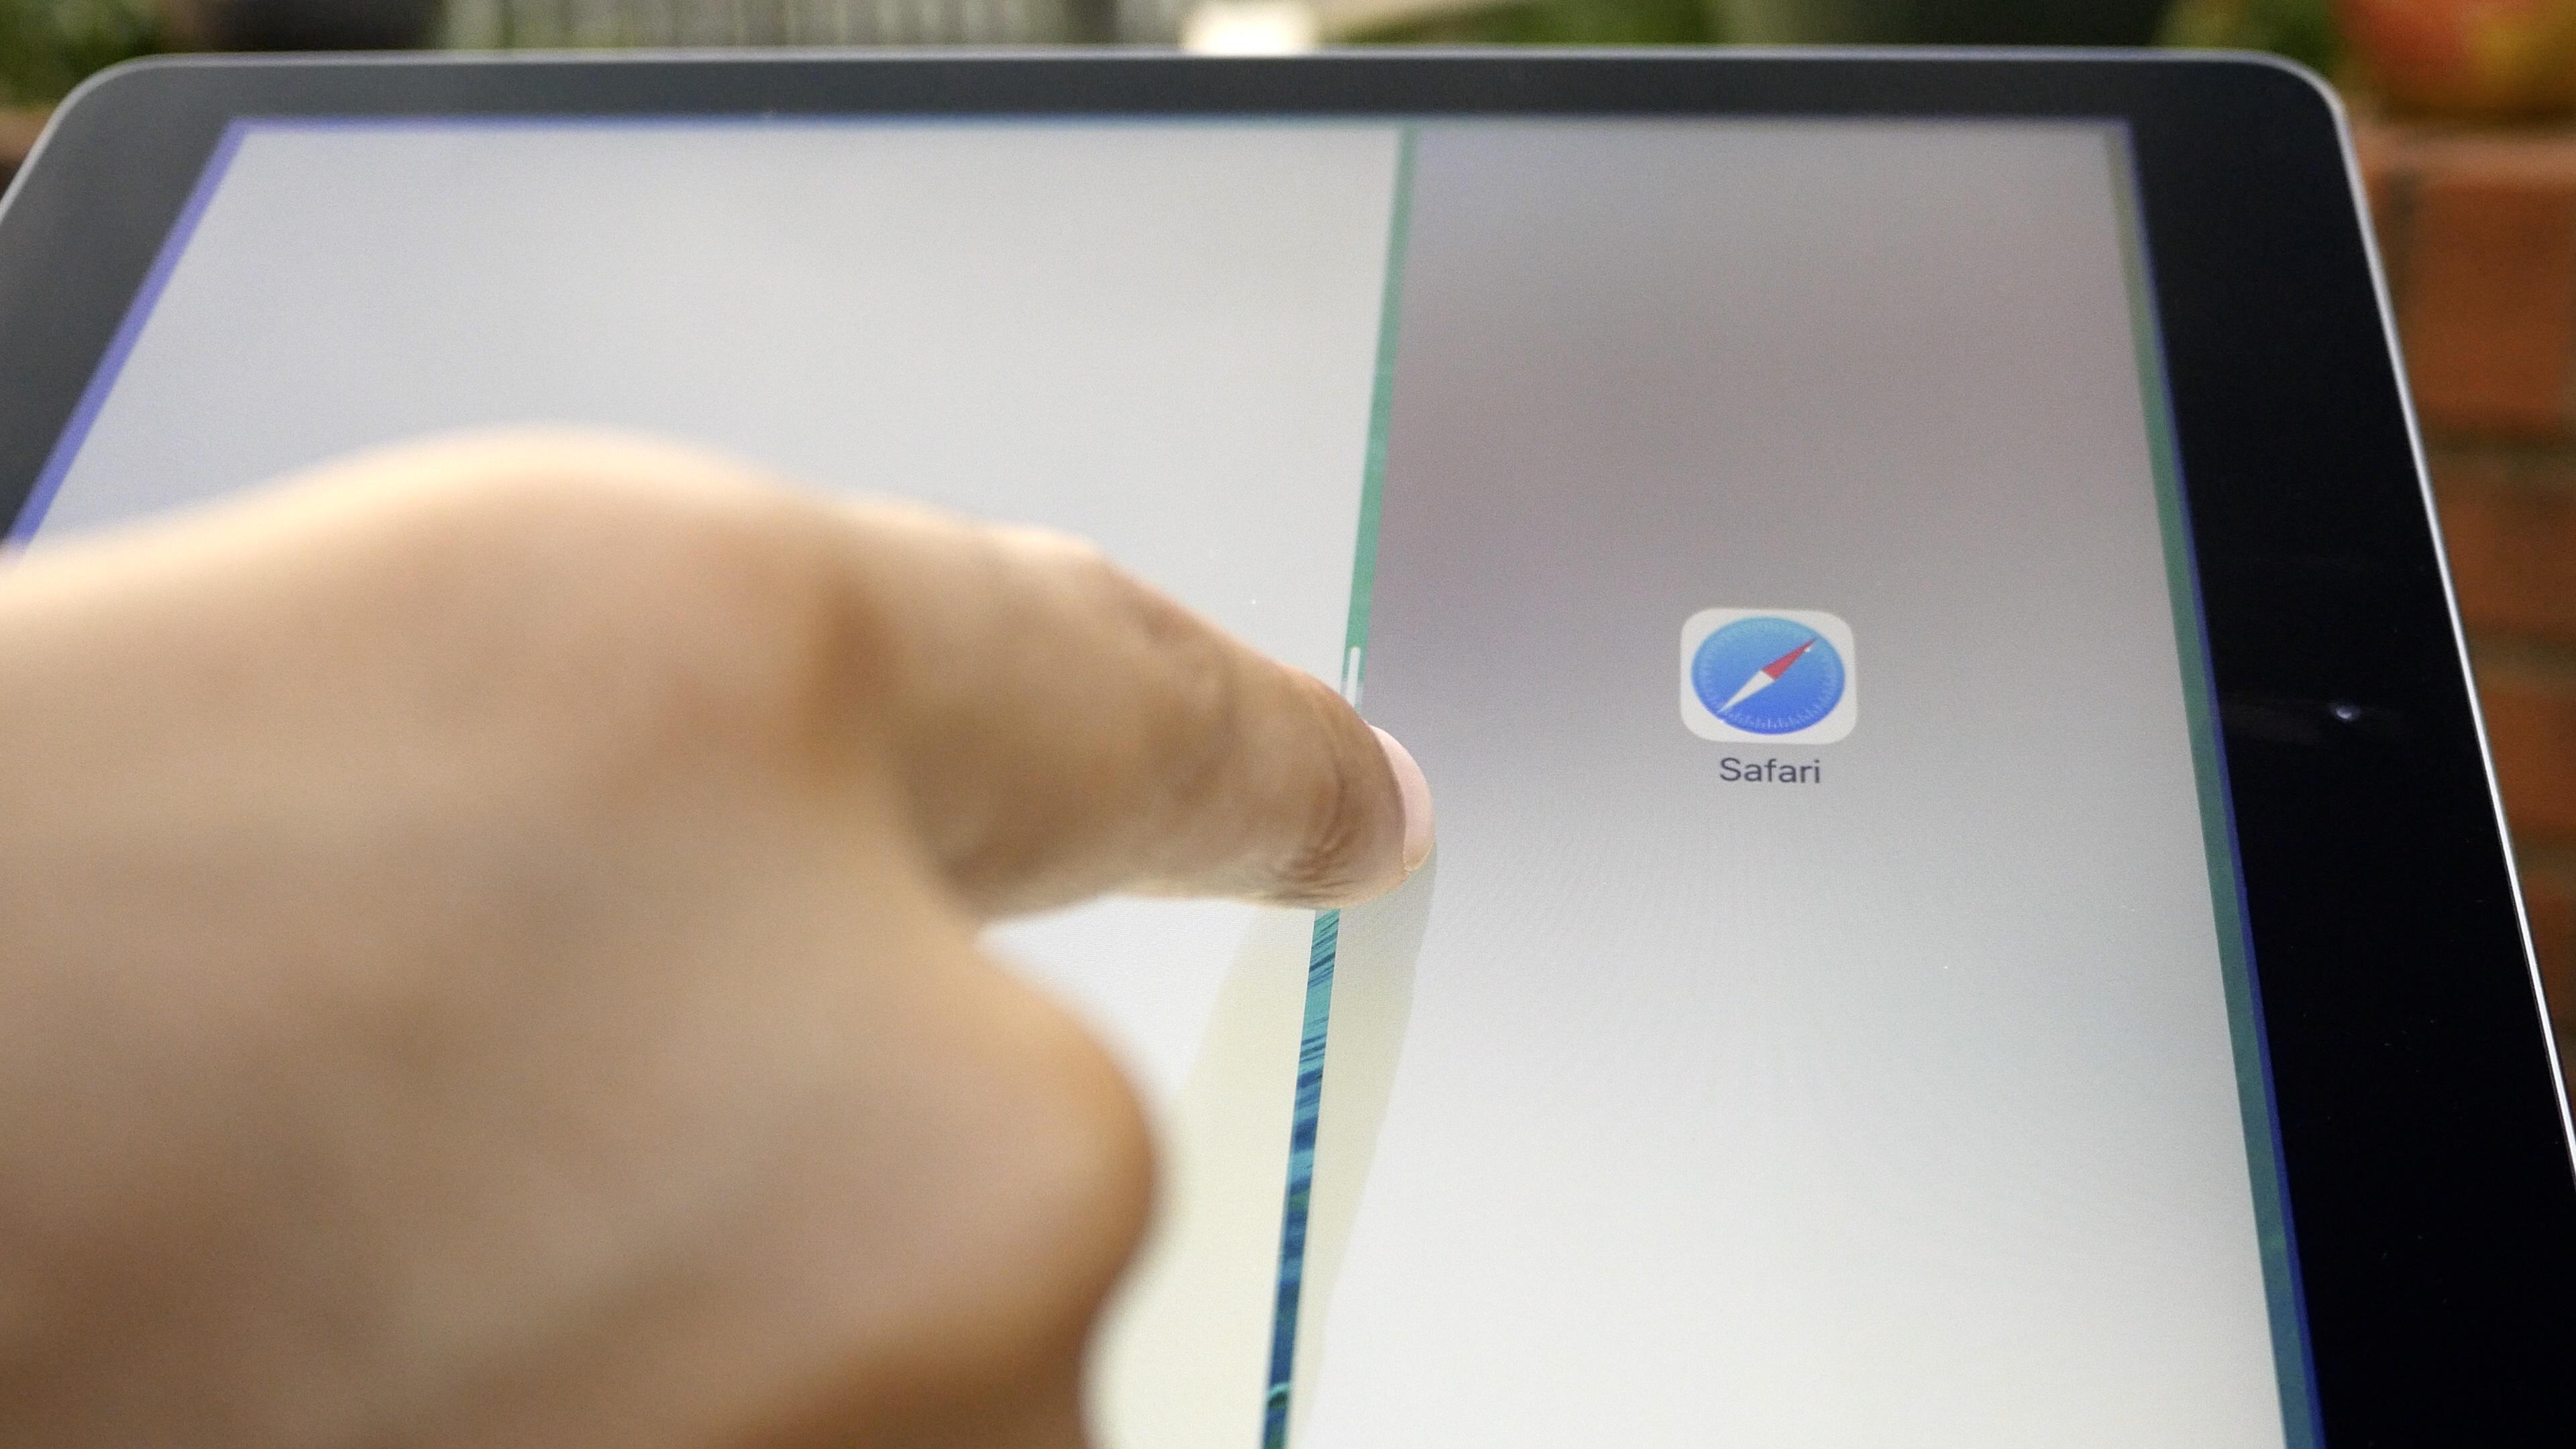 iPad Air 2 Split View